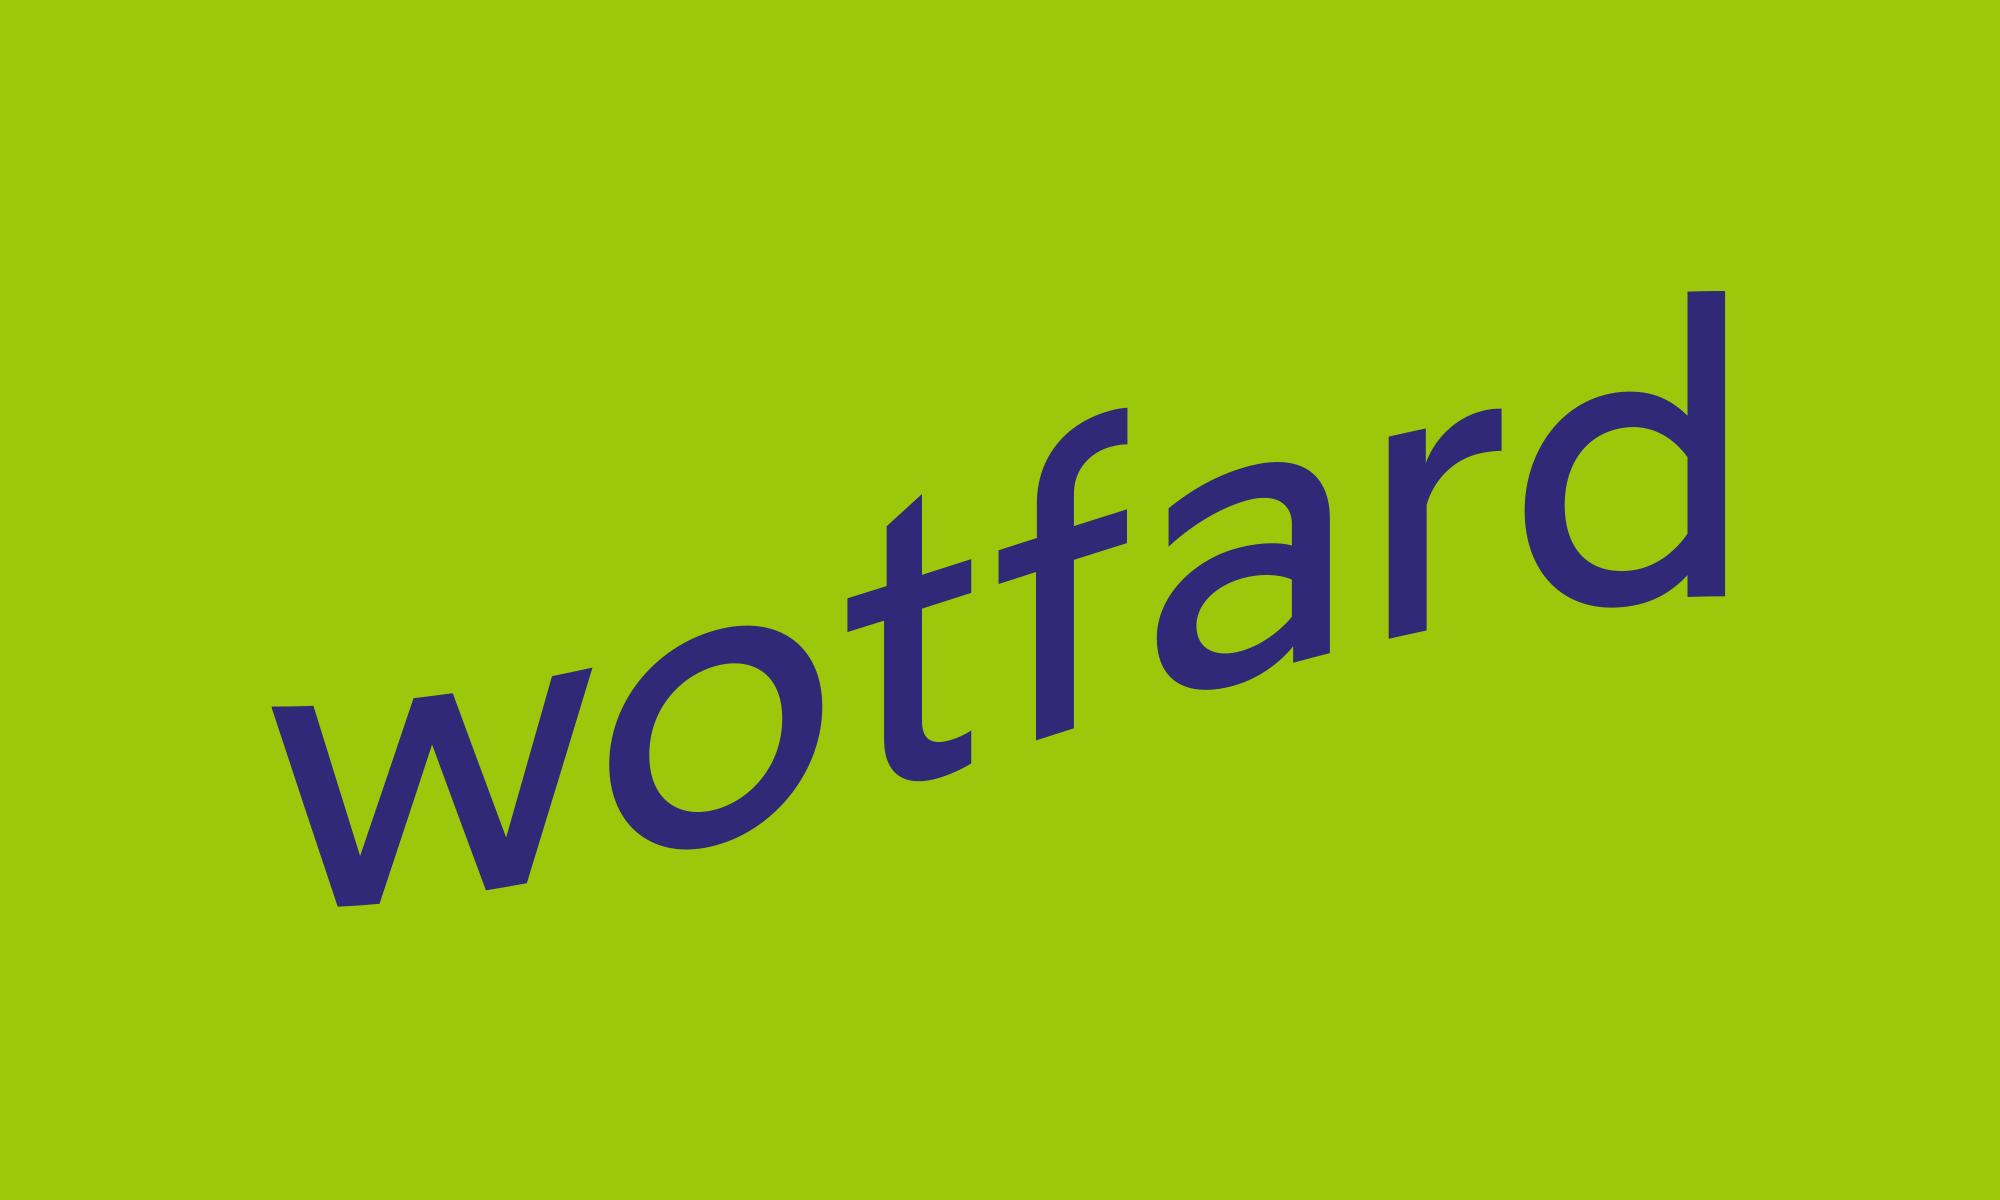 Wotfard Typeface